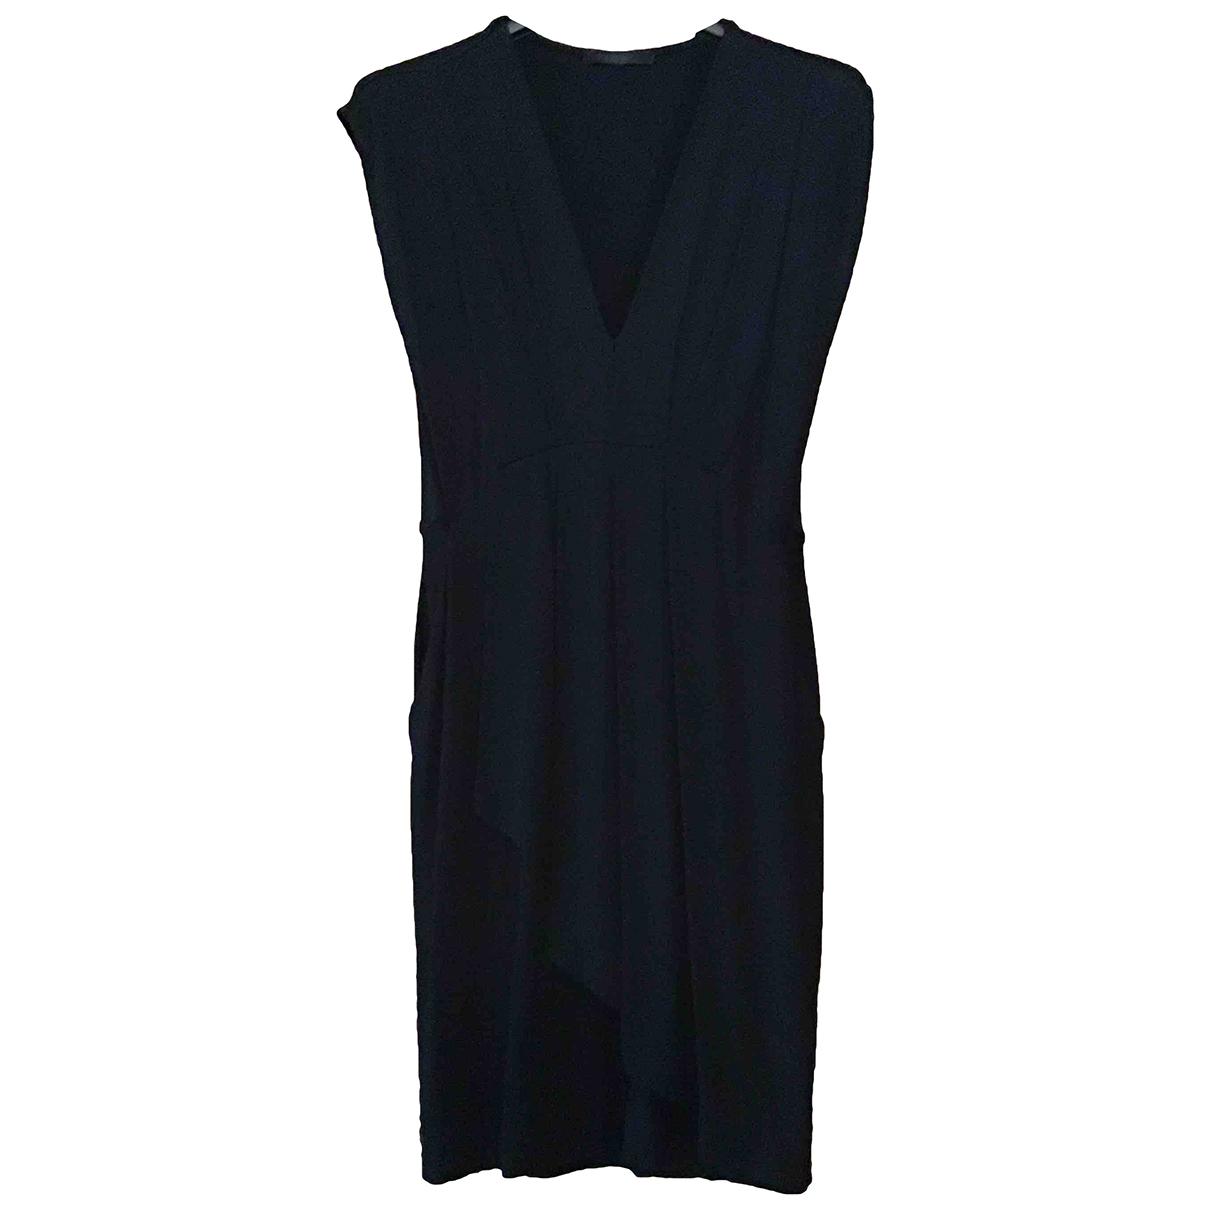 Pinko \N Black Cotton - elasthane dress for Women S International